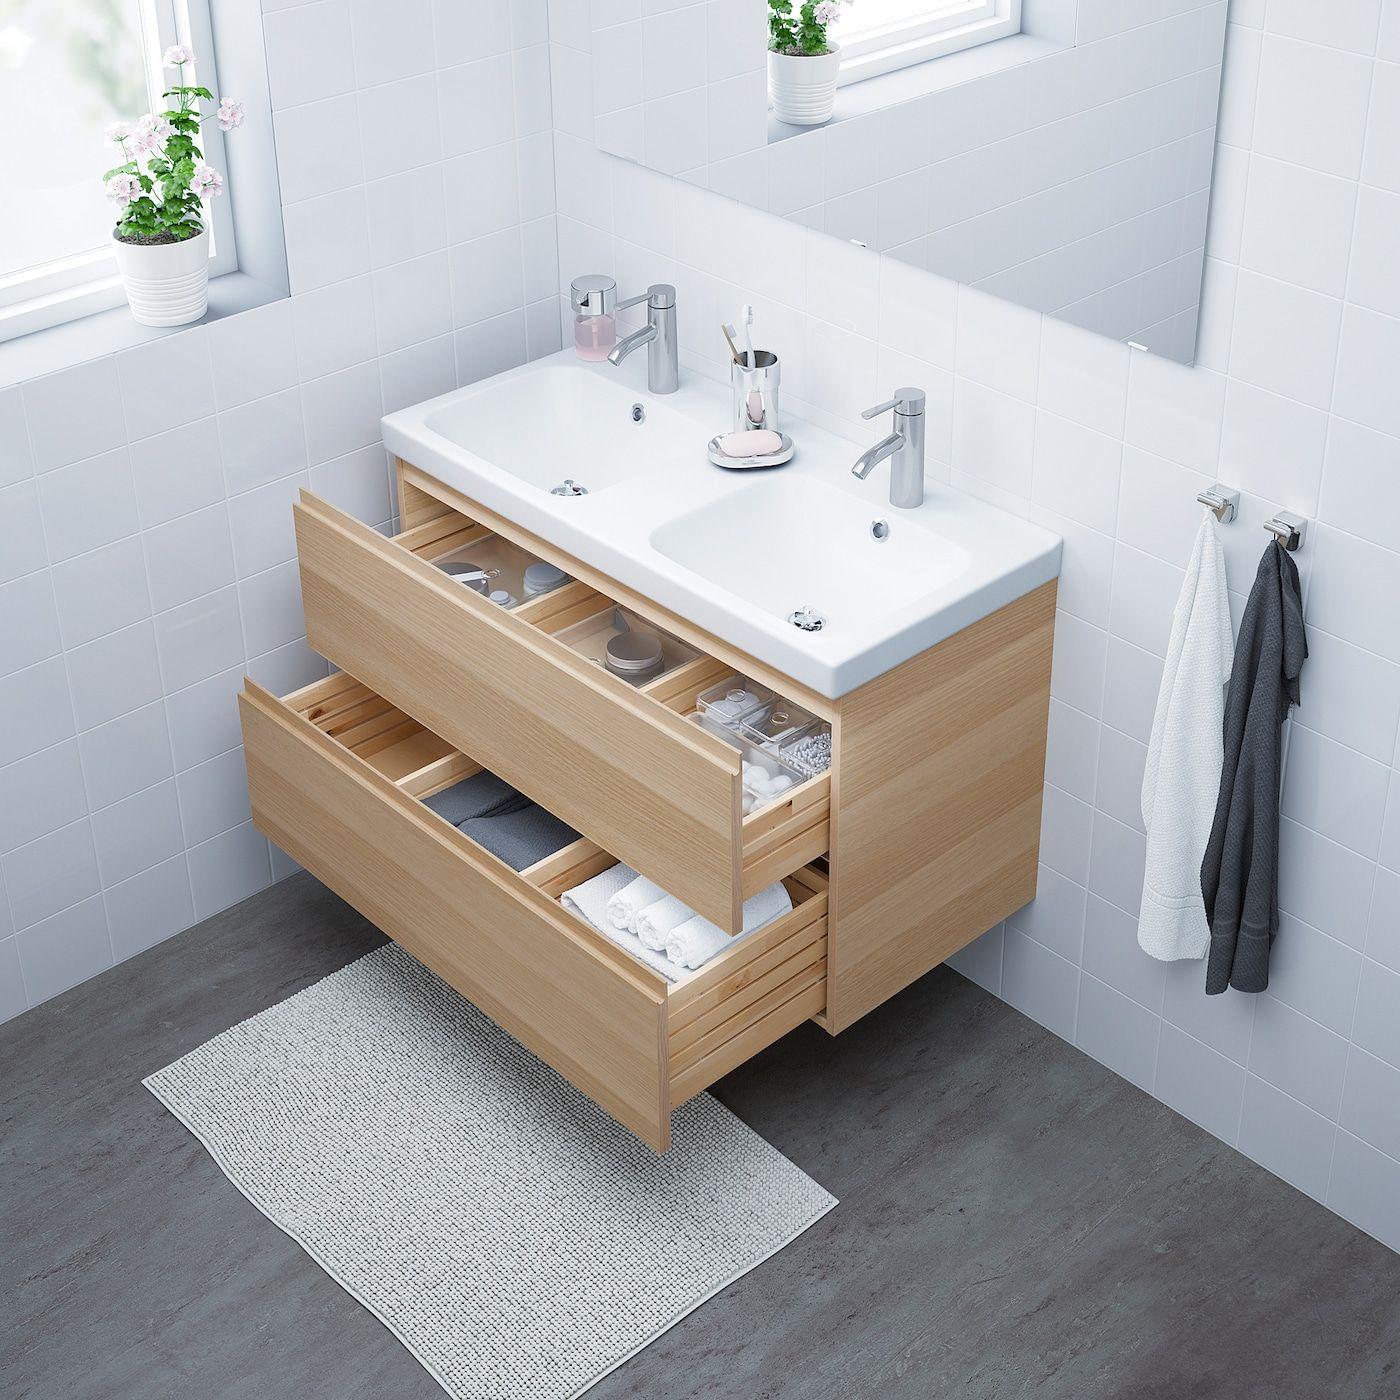 Godmorgon Odensvik Sink Cabinet With 2 Drawers White Stained Oak Effect Dalskar Faucet 40 1 2x19 1 4x2 In 2020 Bathroom Vanity Ikea Godmorgon Diy Bathroom Storage